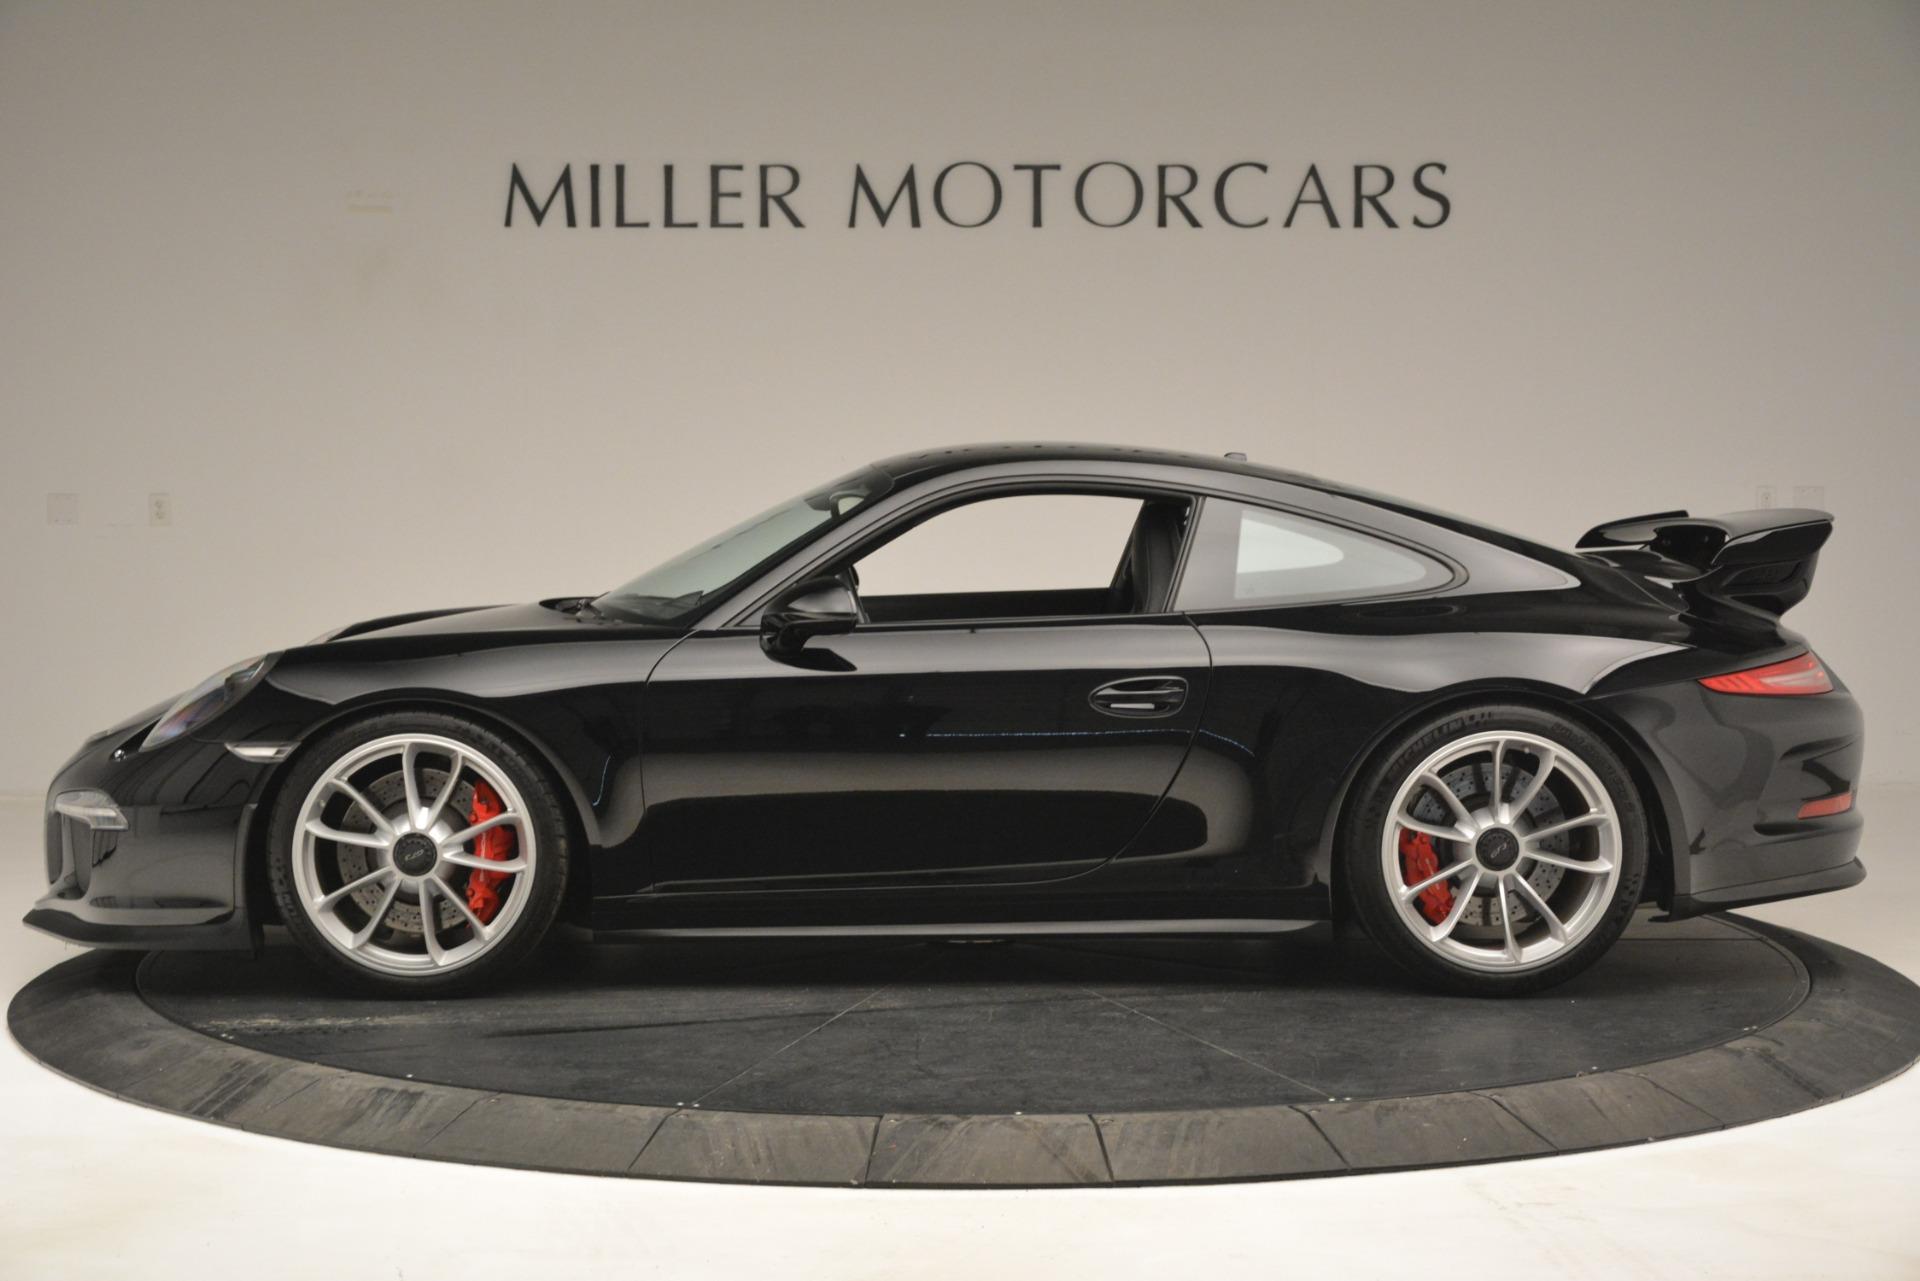 Used 2015 Porsche 911 GT3 For Sale In Greenwich, CT. Alfa Romeo of Greenwich, 7516 3009_p3